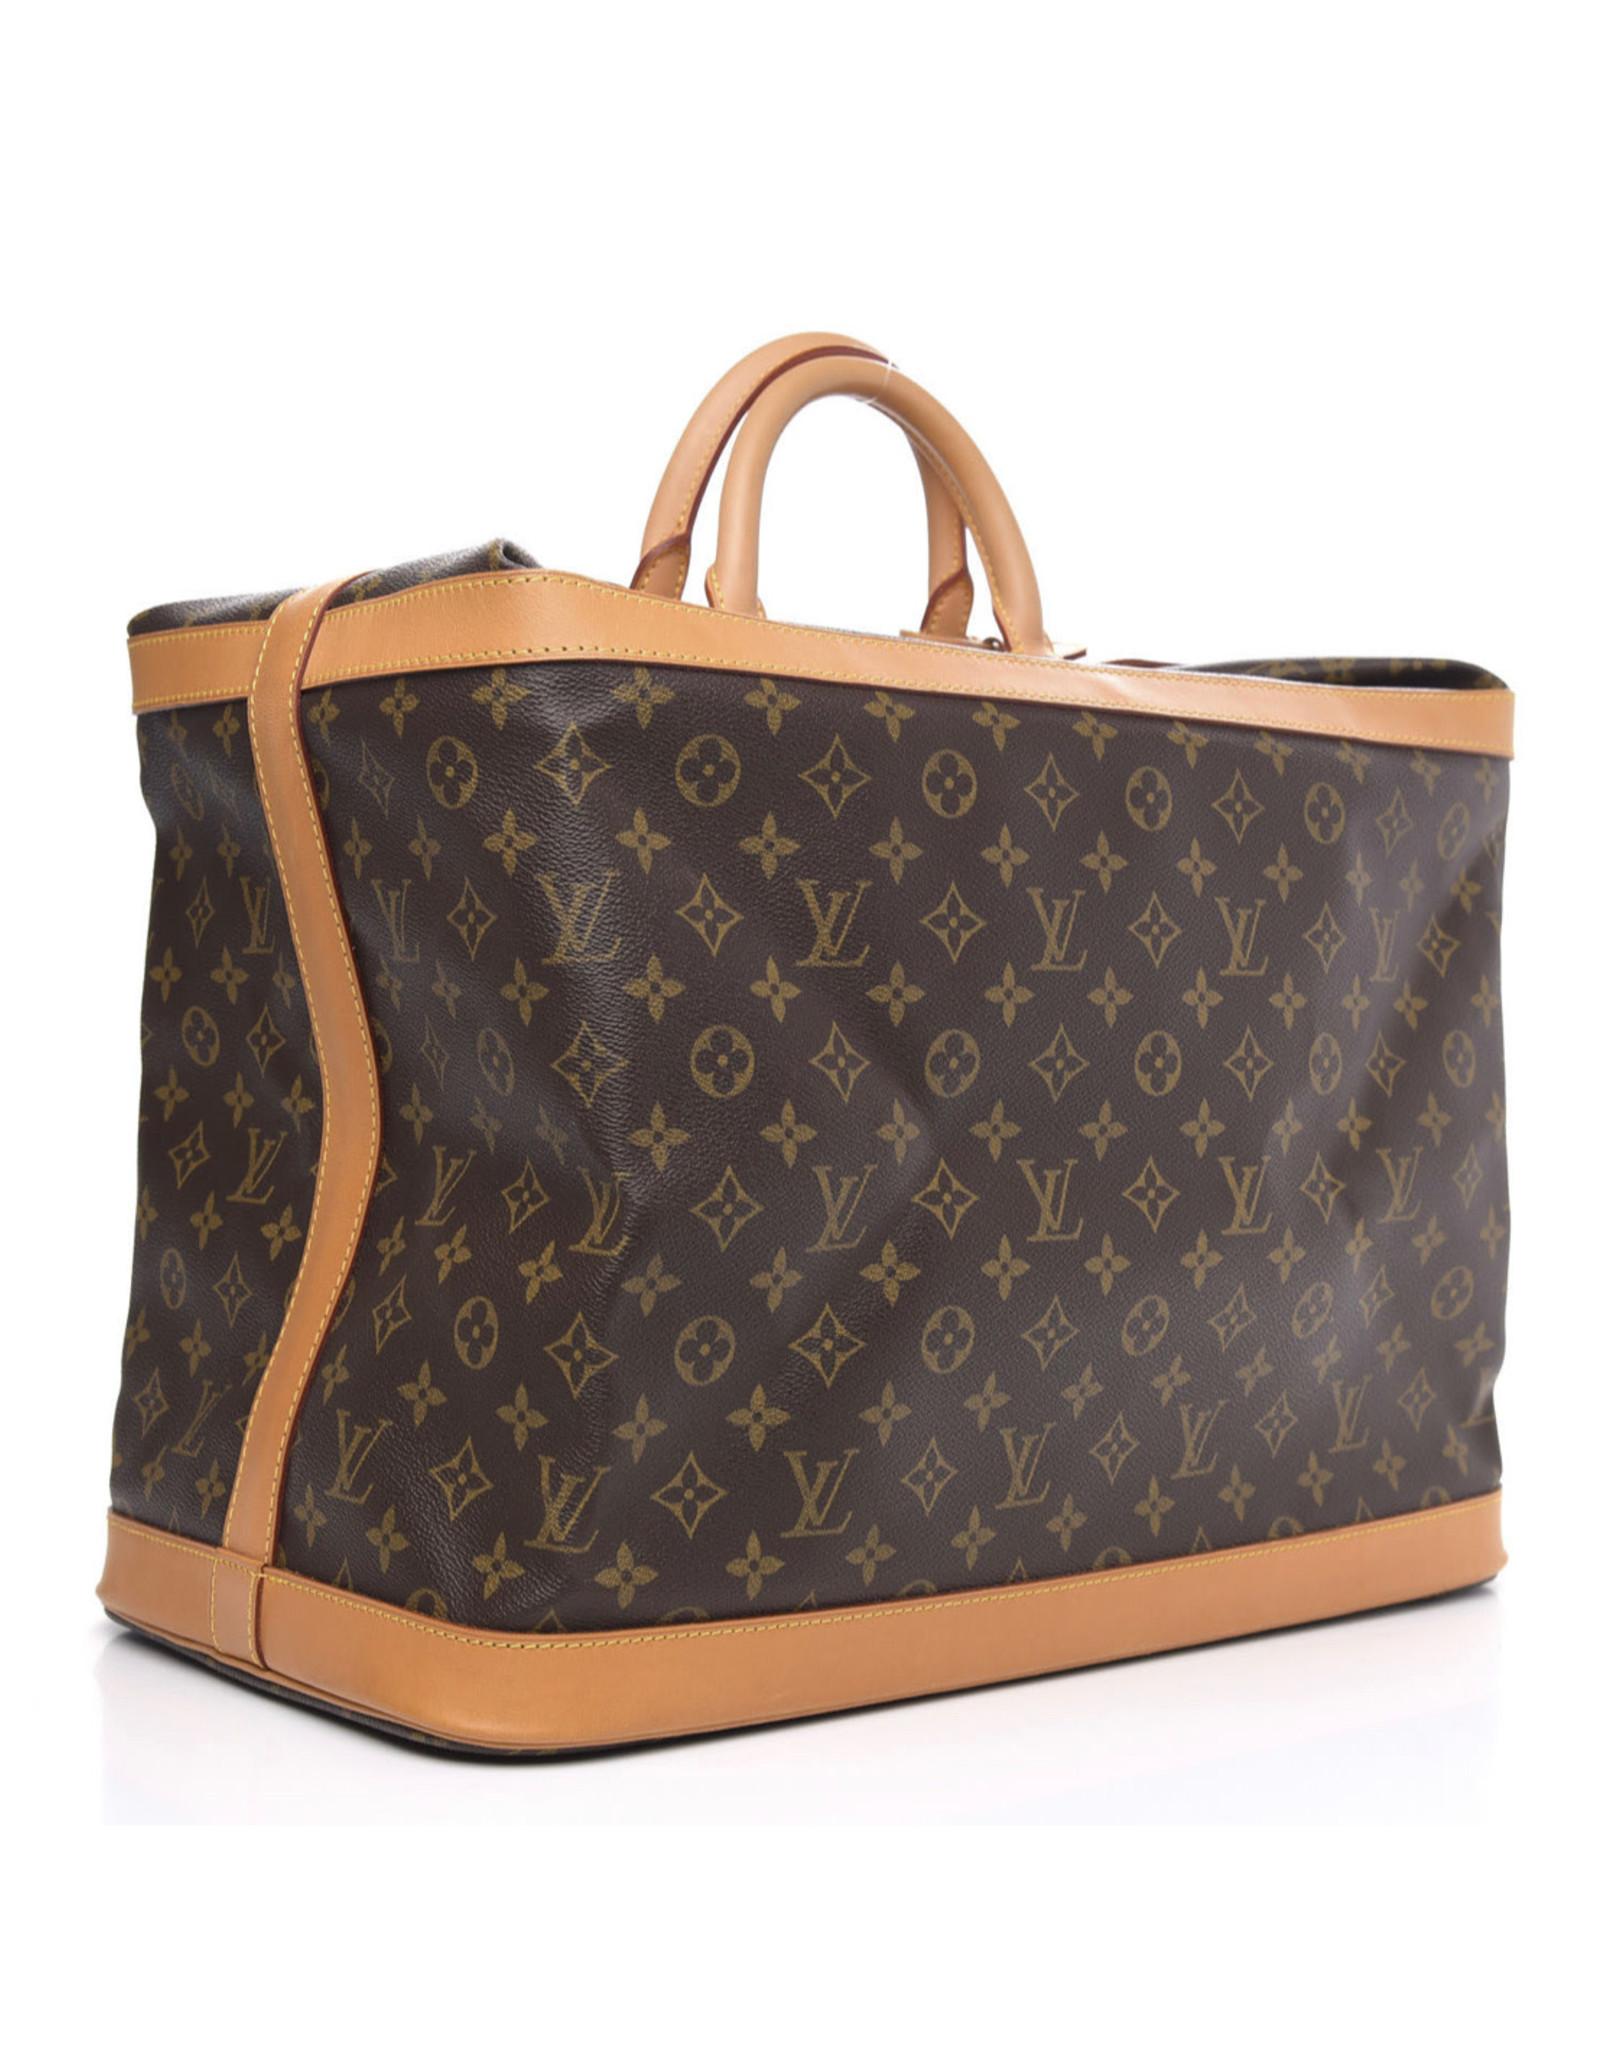 Wyld Blue Vintage Louis Vuitton Luggage Bag